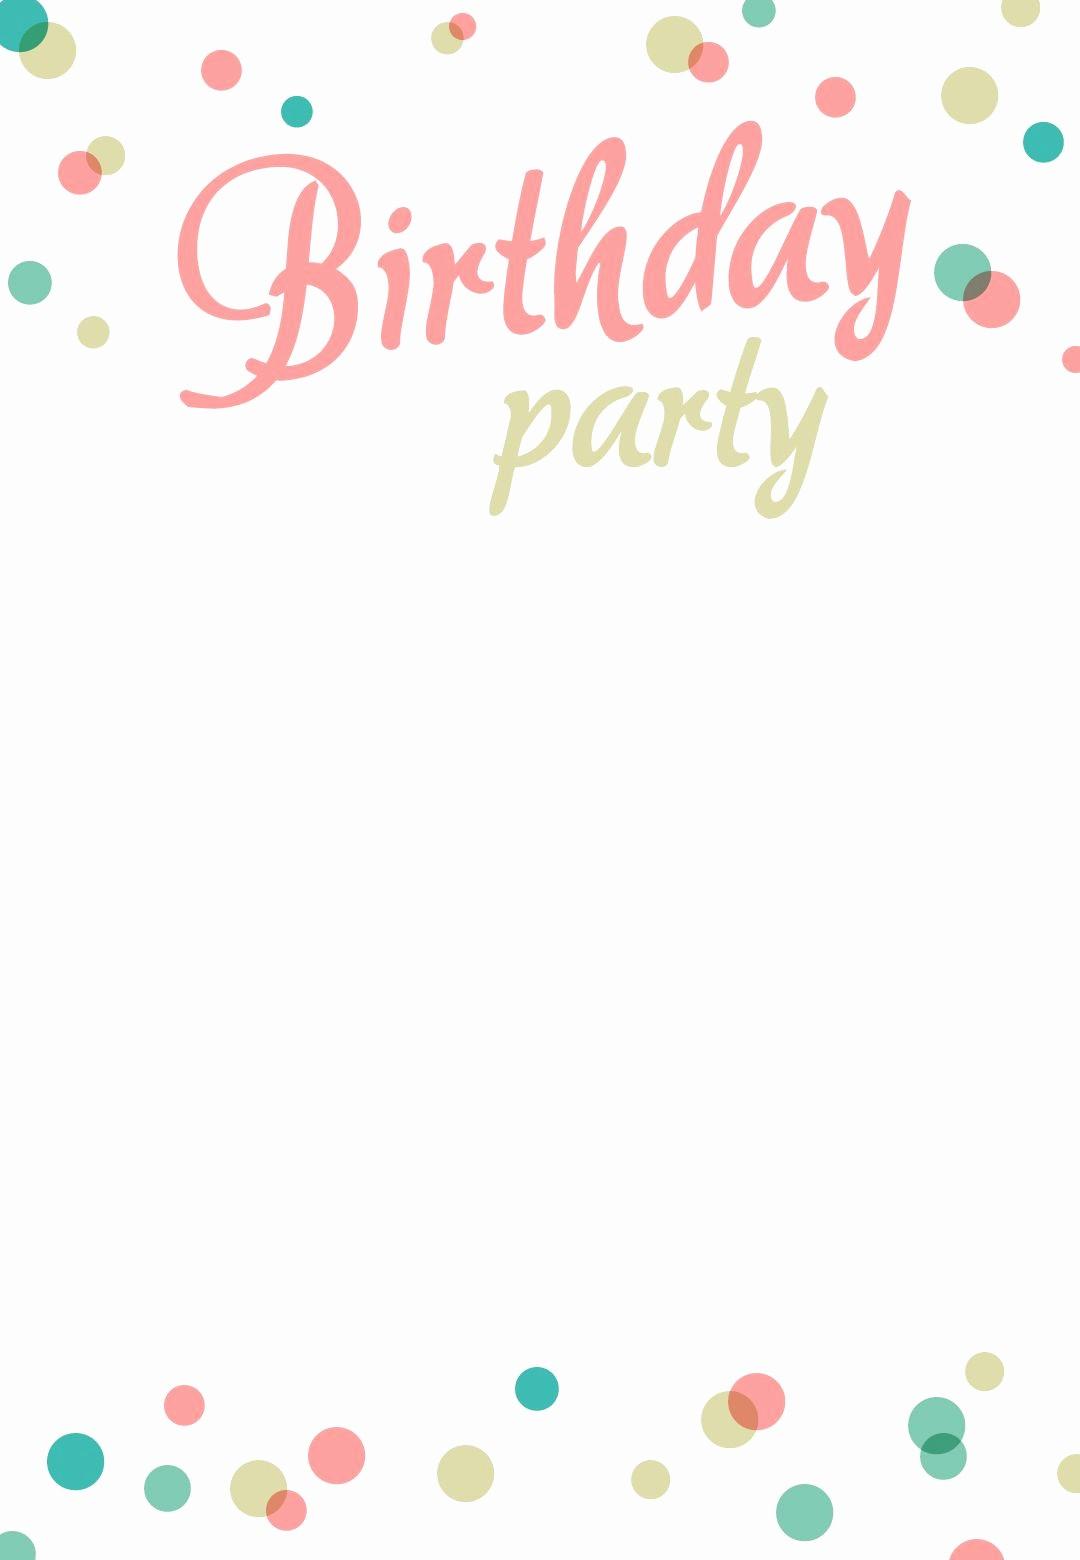 Kids Birthday Party Invites Templates Beautiful Birthday Party Invitation Free Printable